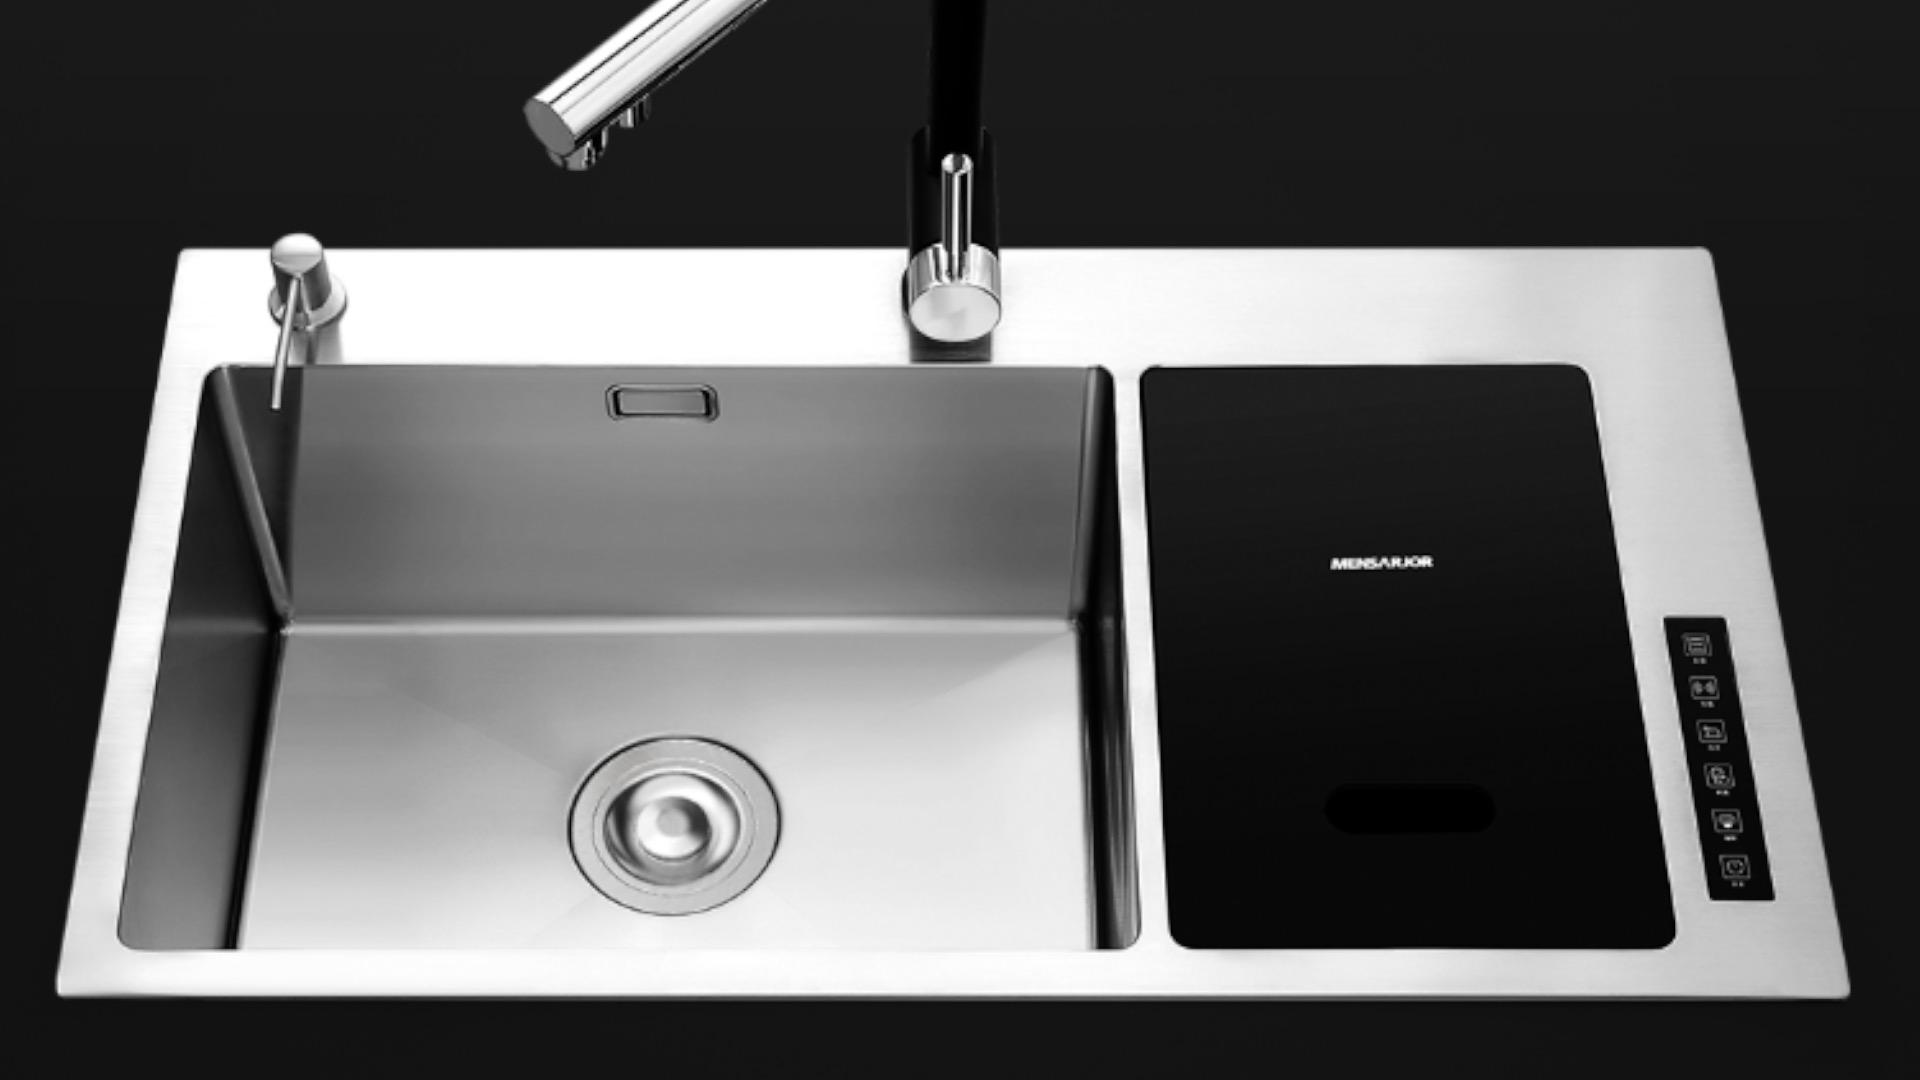 Xiaomi Mensarjor Sink Washing Machine